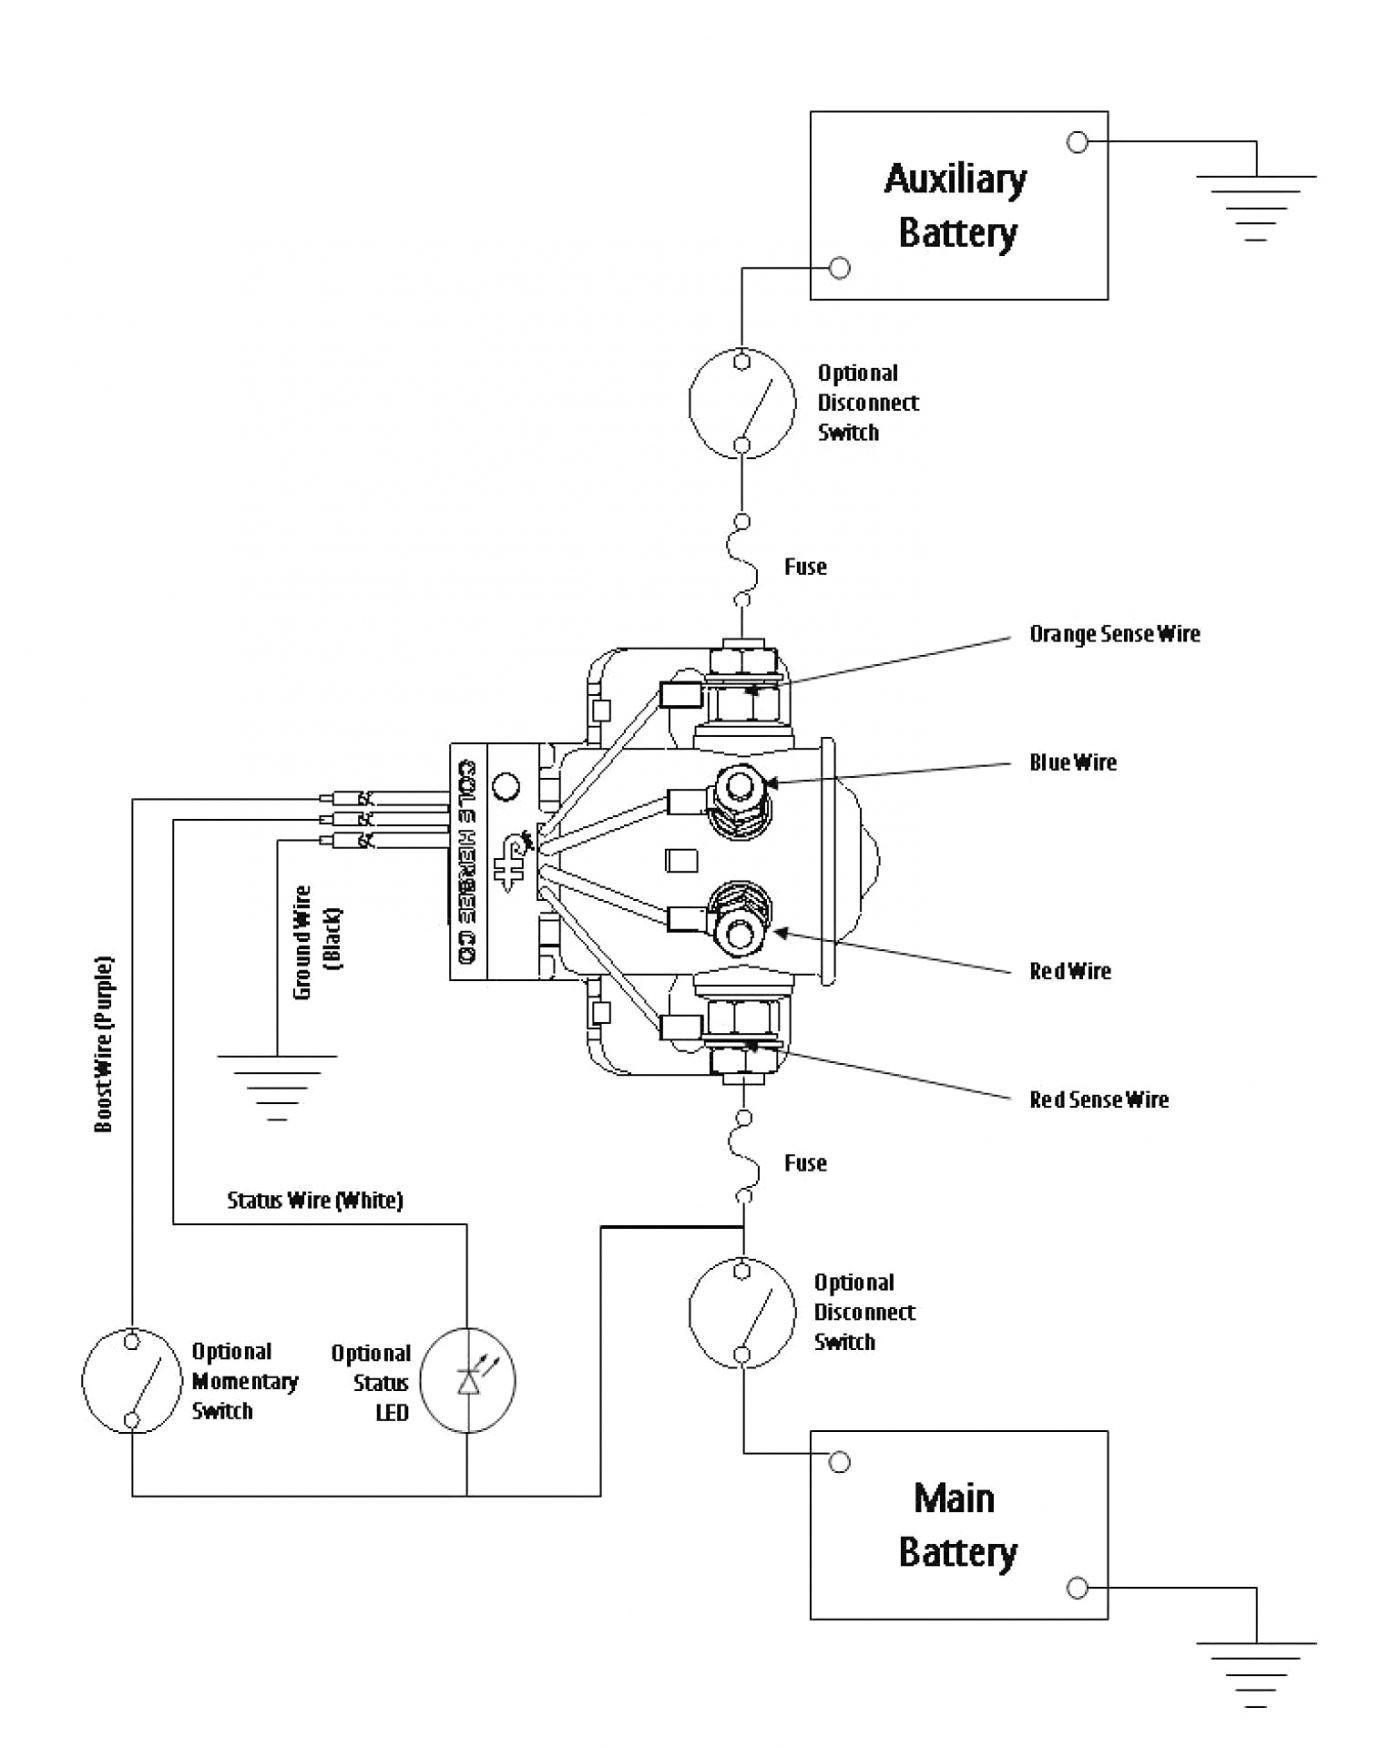 denso alternator wiring diagram piglmedium resolution of denso alternator wiring diagram pigl data wiring diagram schema